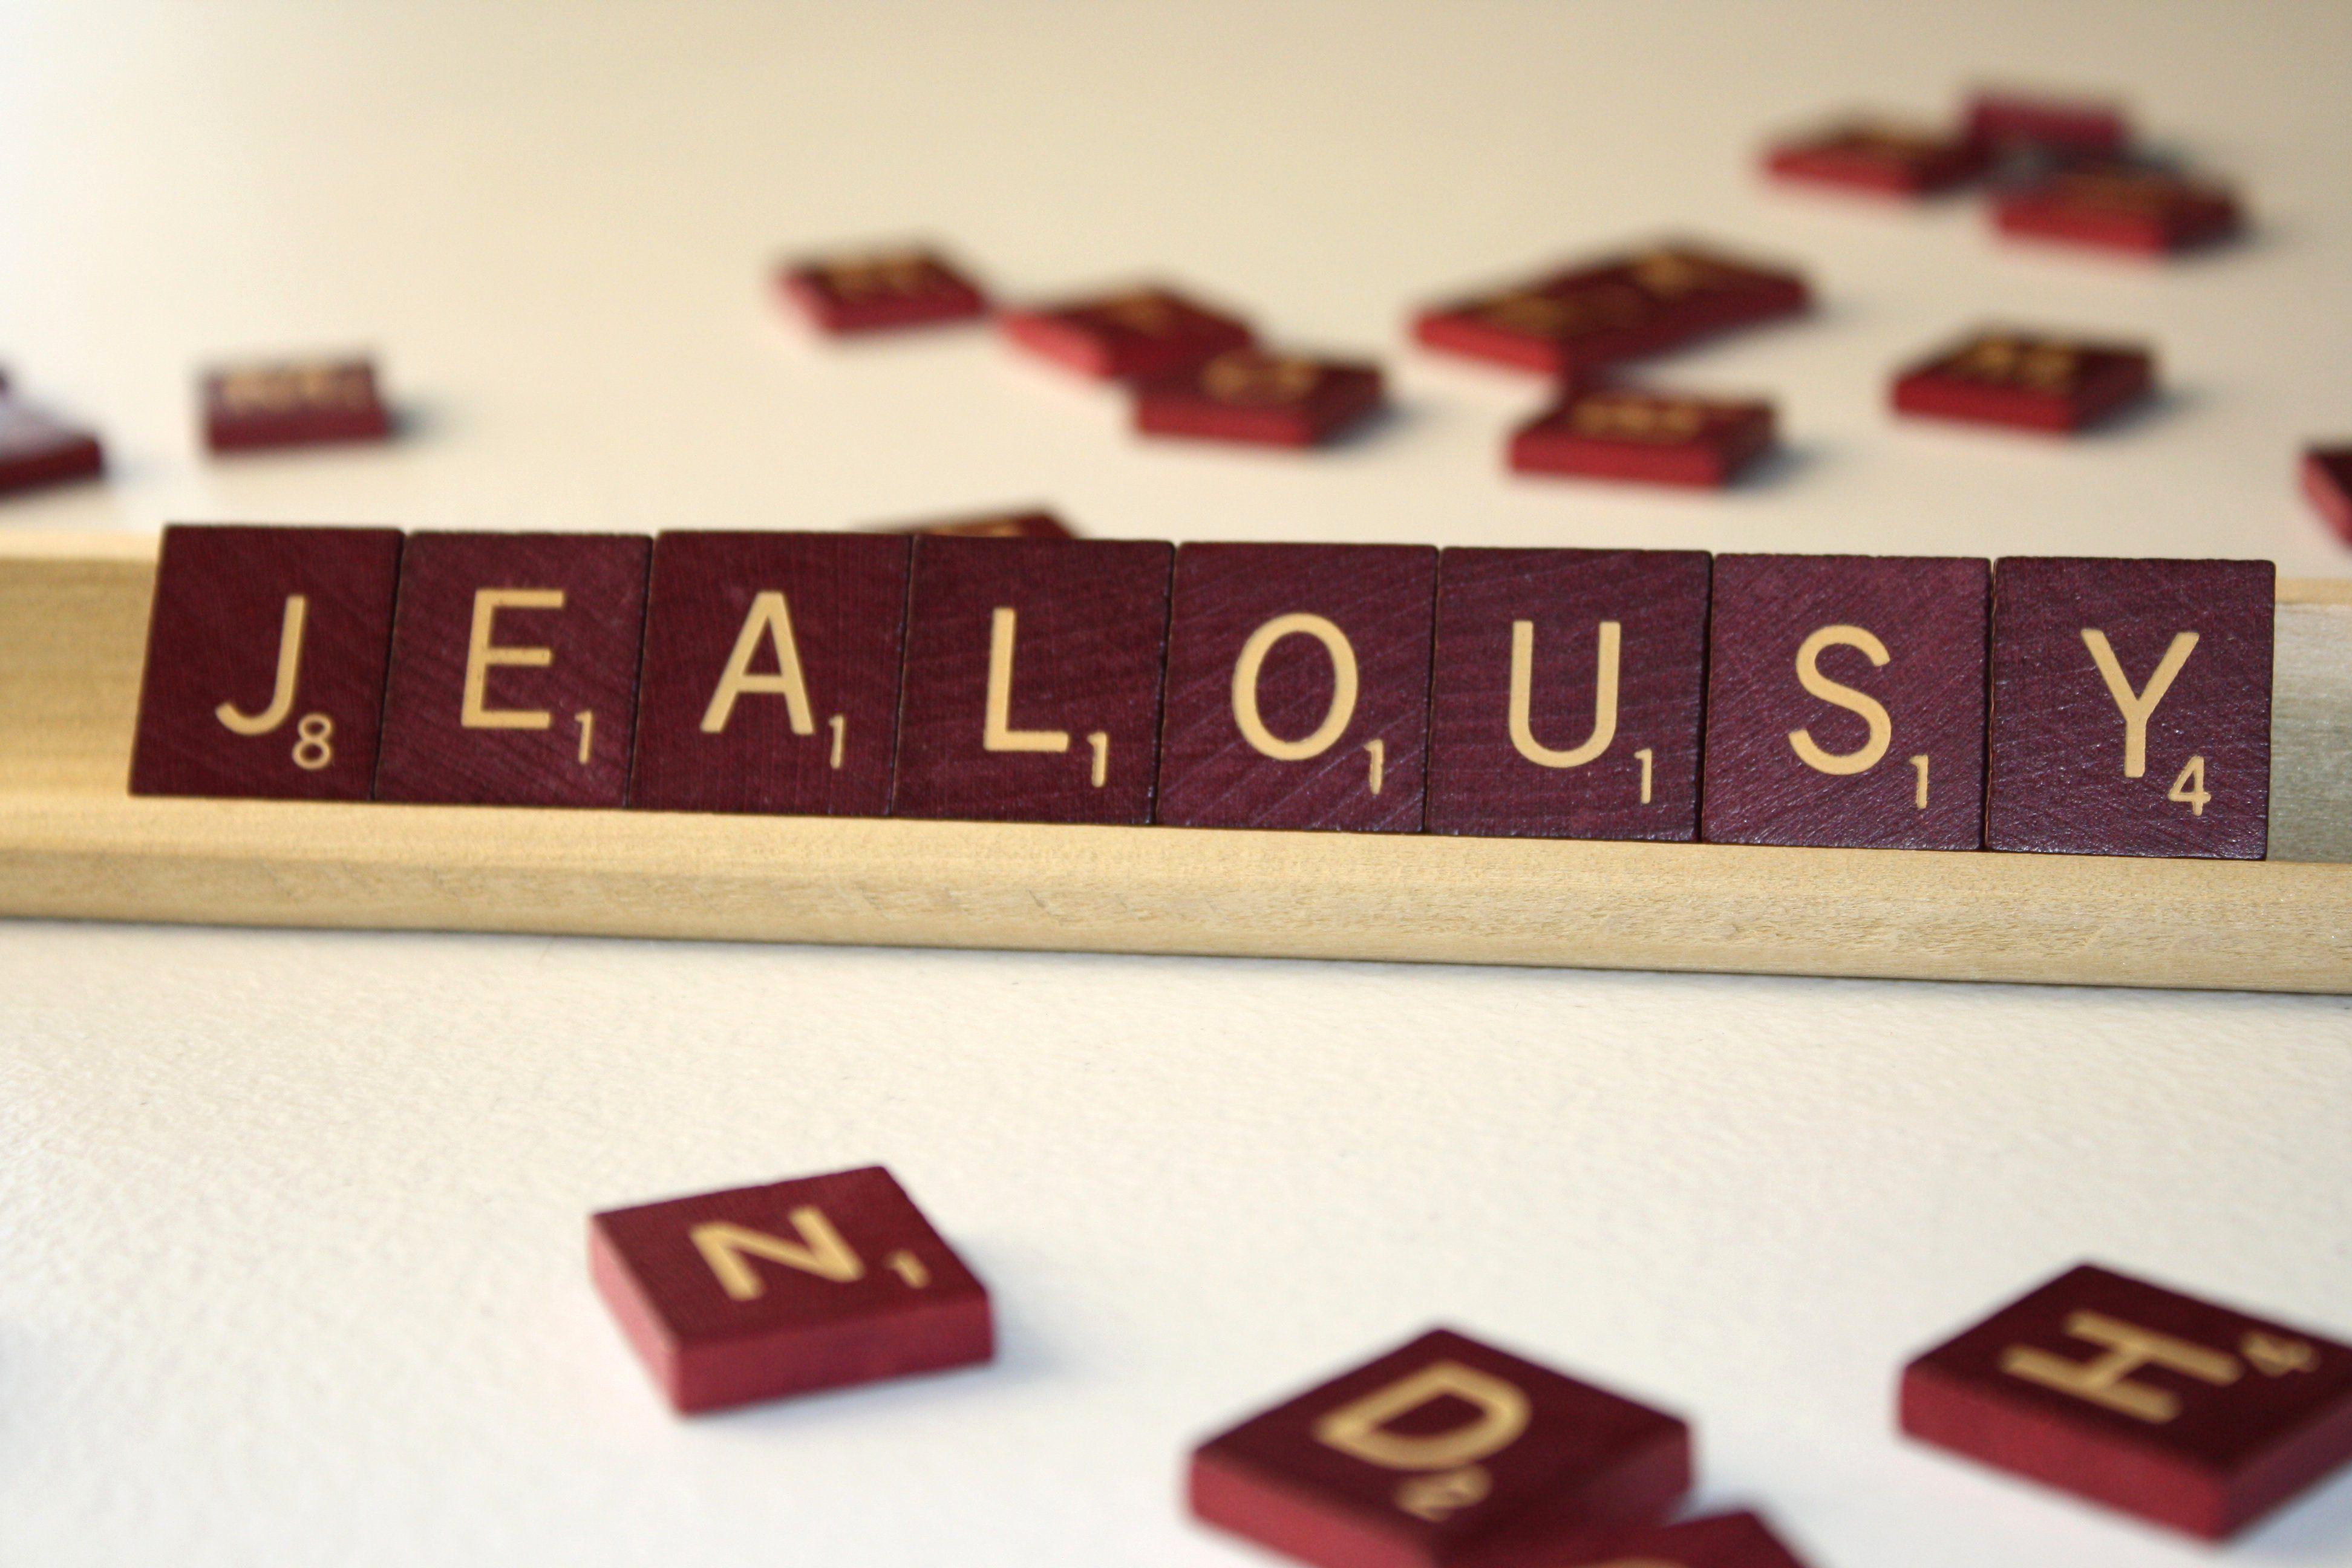 Come capire se lui è geloso